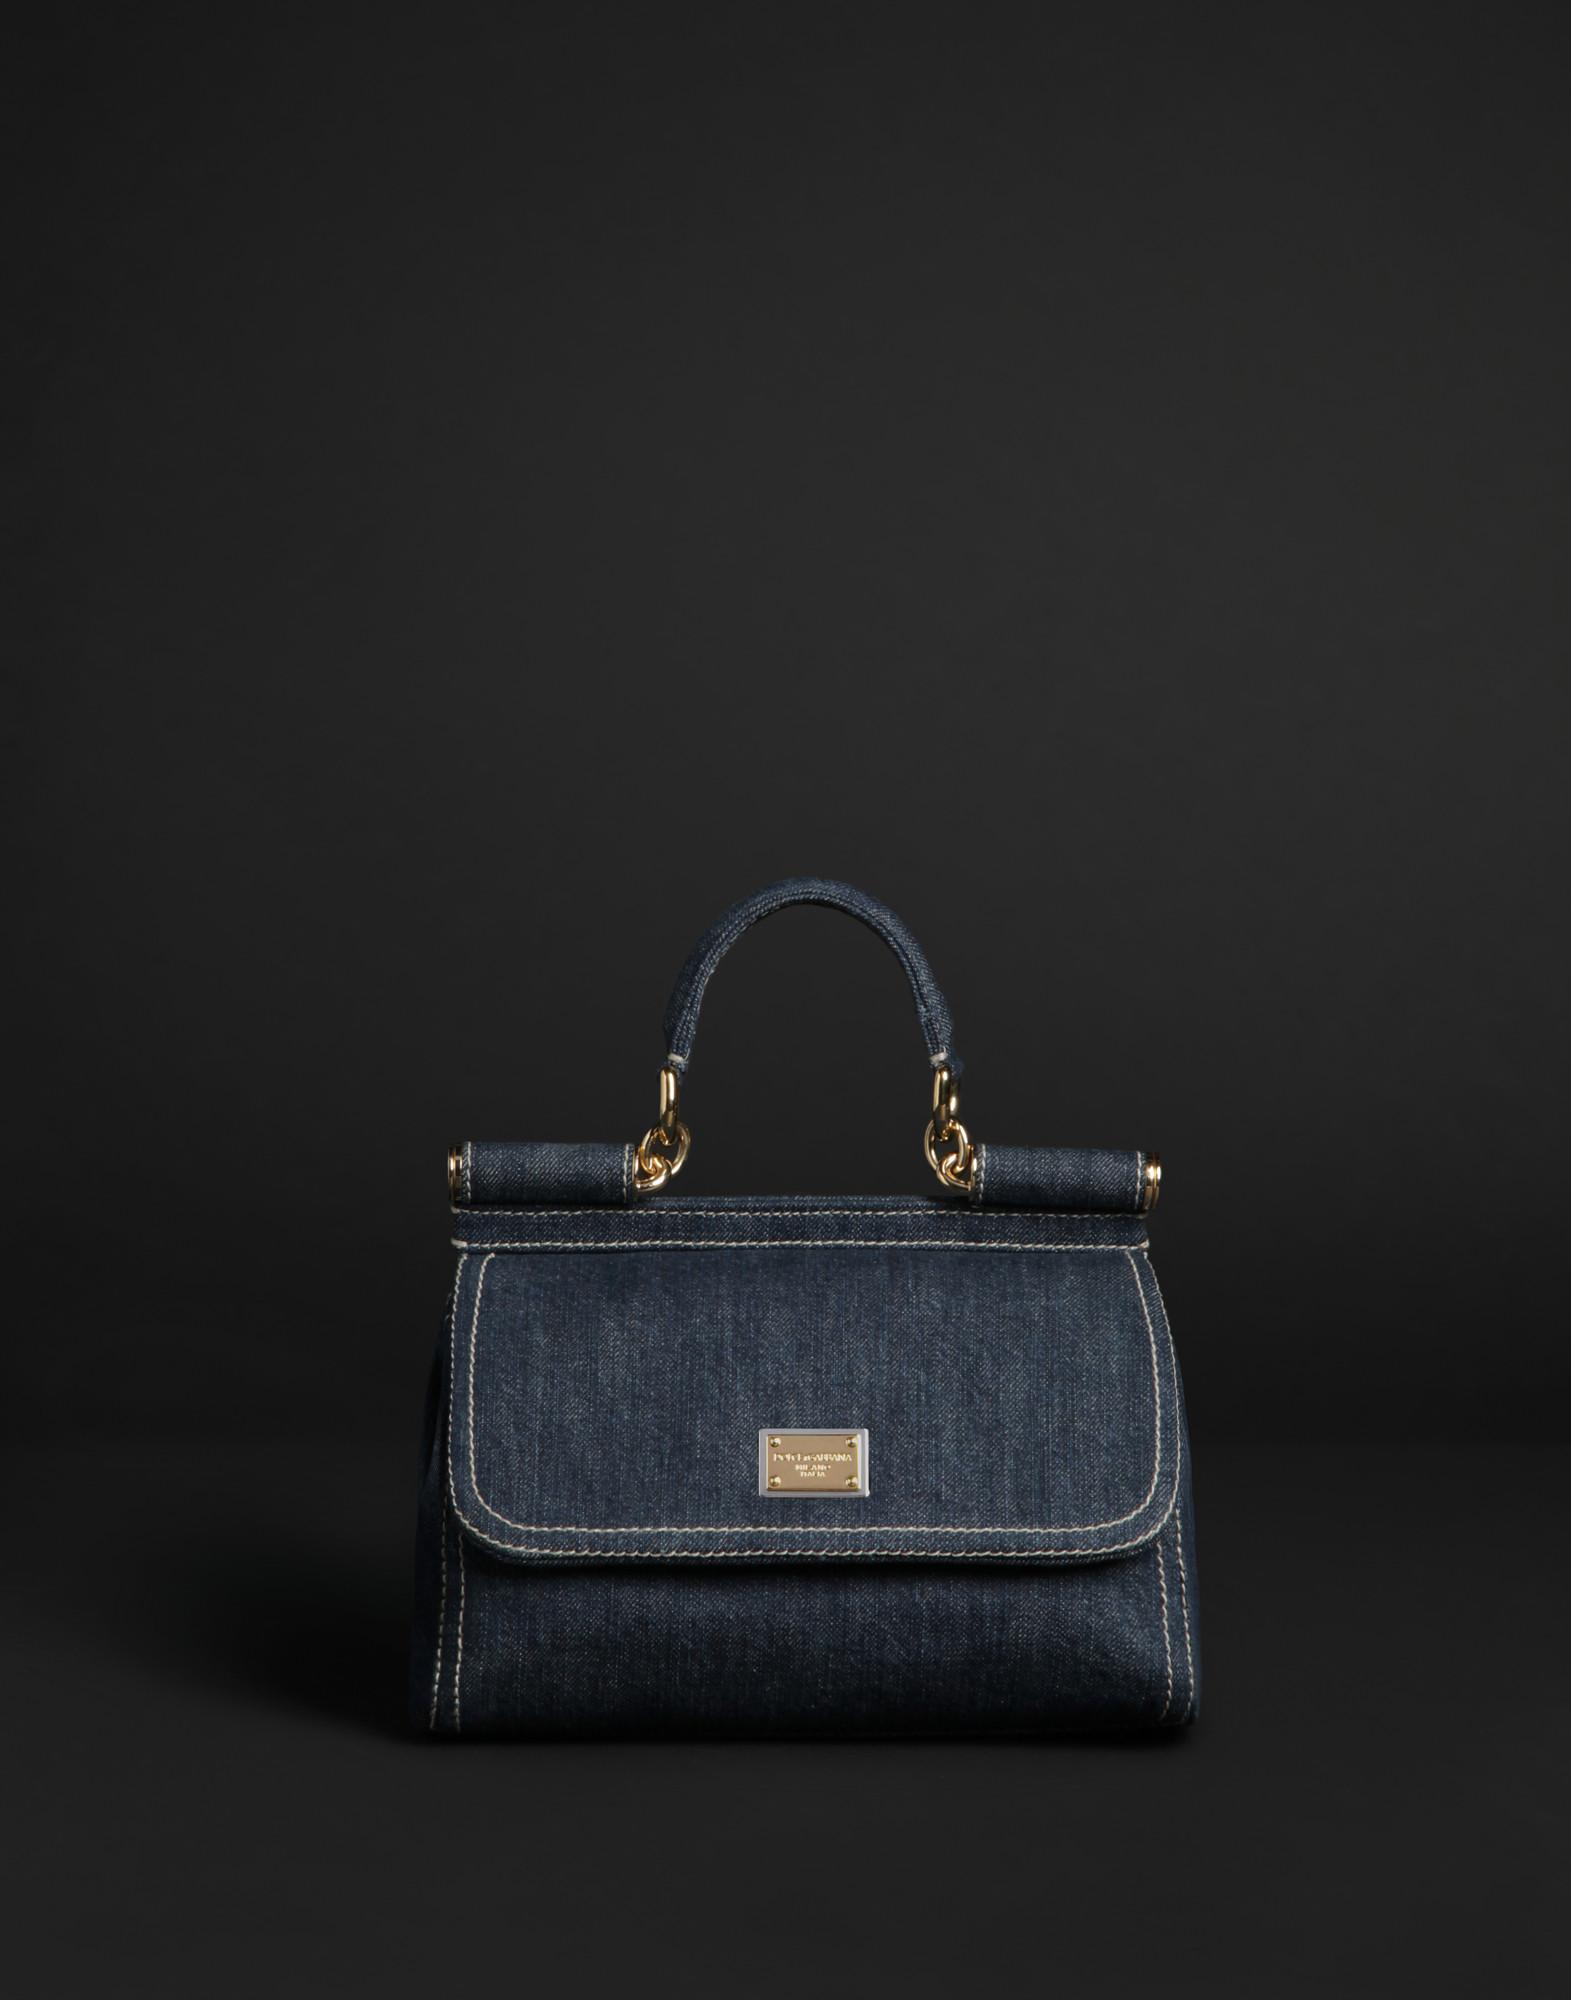 8_Dolce-Gabbana-blue-fabric-Miss-Sicily-tote-1 (1)